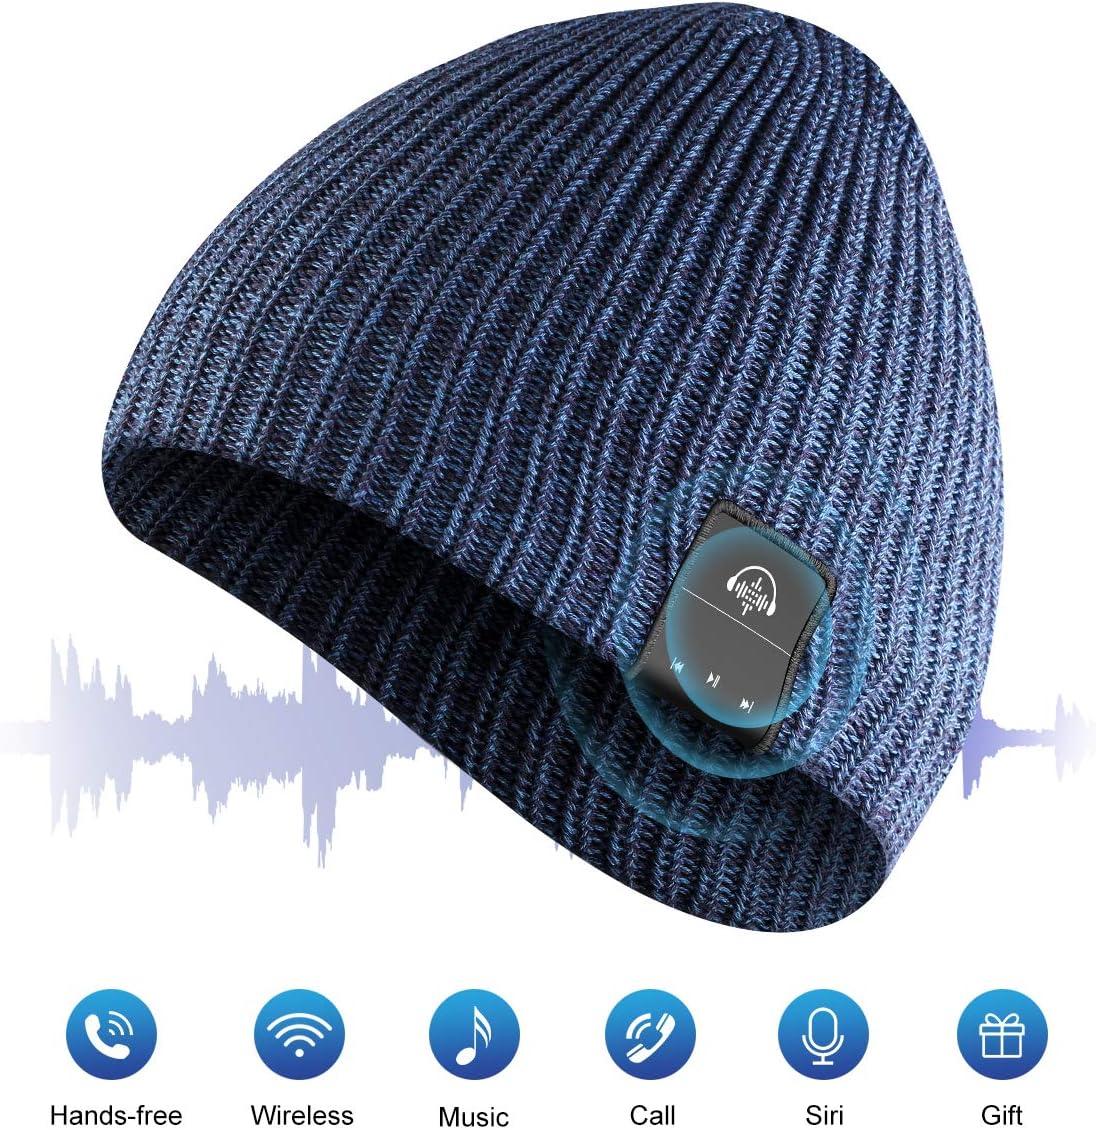 AMYYMA Wireless Beanie Music Hat, Winter Outdoor Sport Knit Cap with HD Stereo Headset Earphone Speaker Siri Voice Mic for Man Women Blue